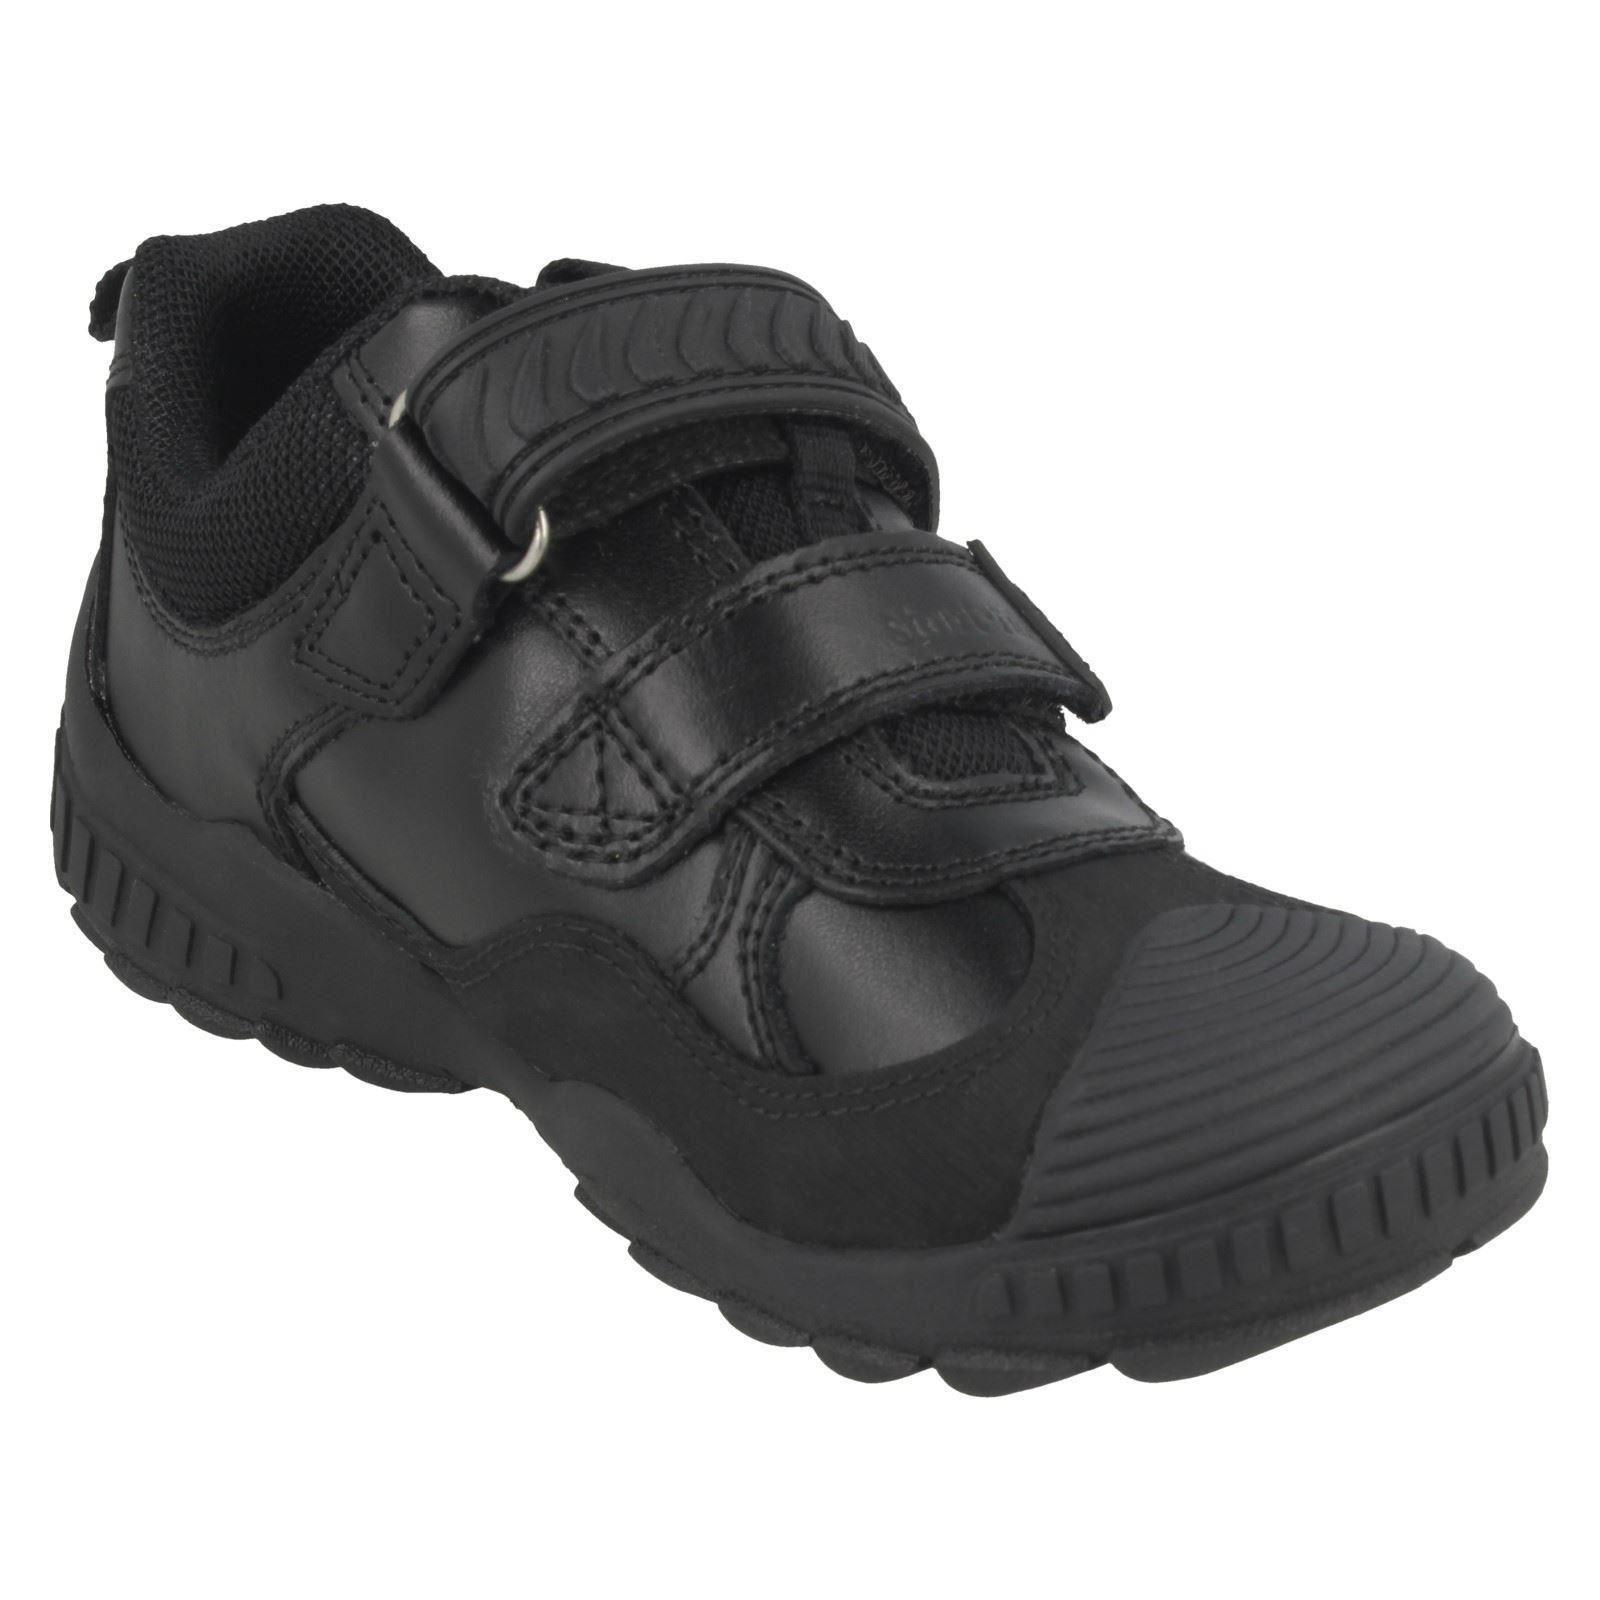 Boys Startrite Double Strap School Shoes Extreme Pri